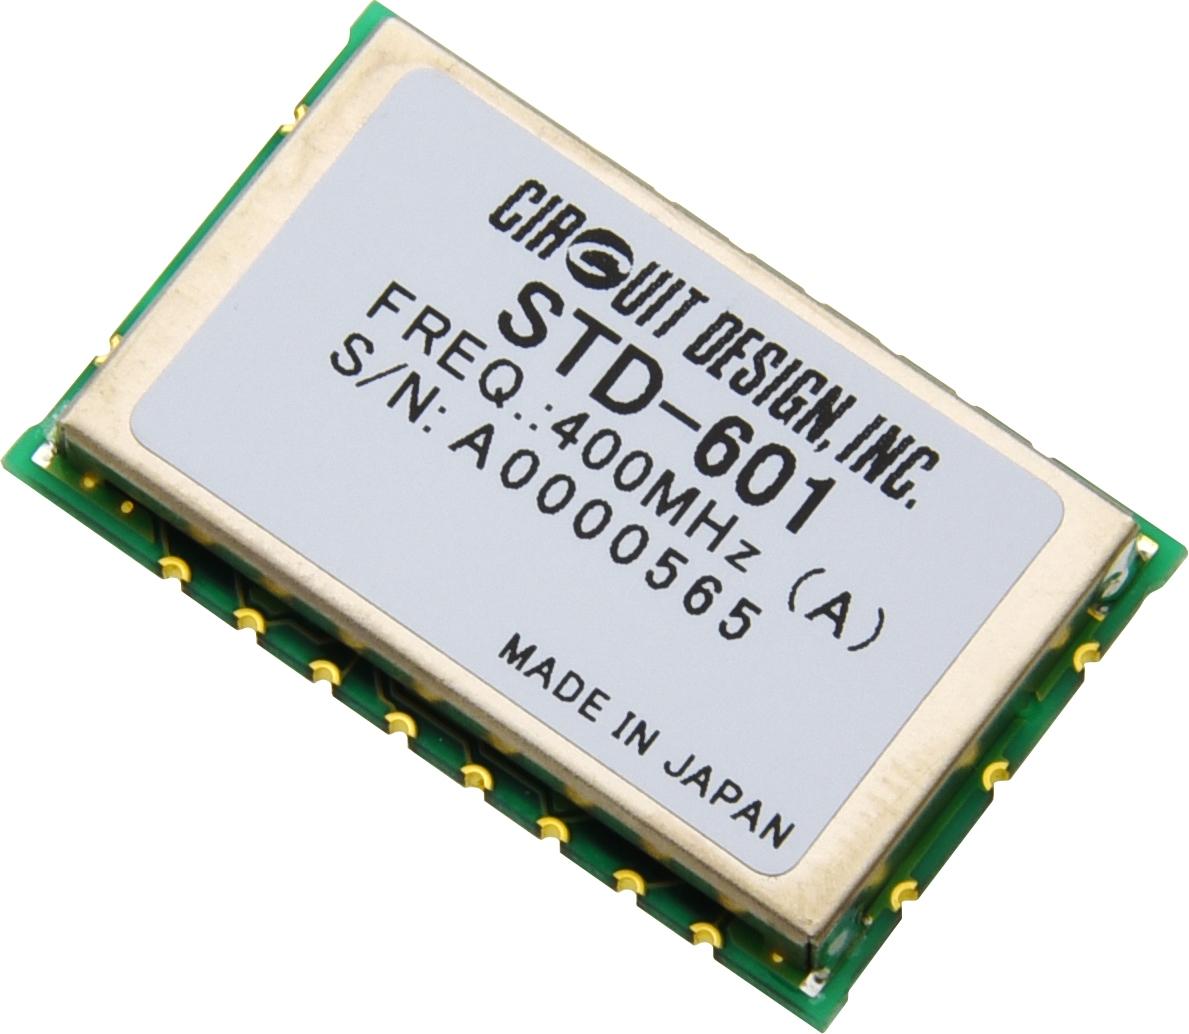 Compact multiband transceiver Circuit Design